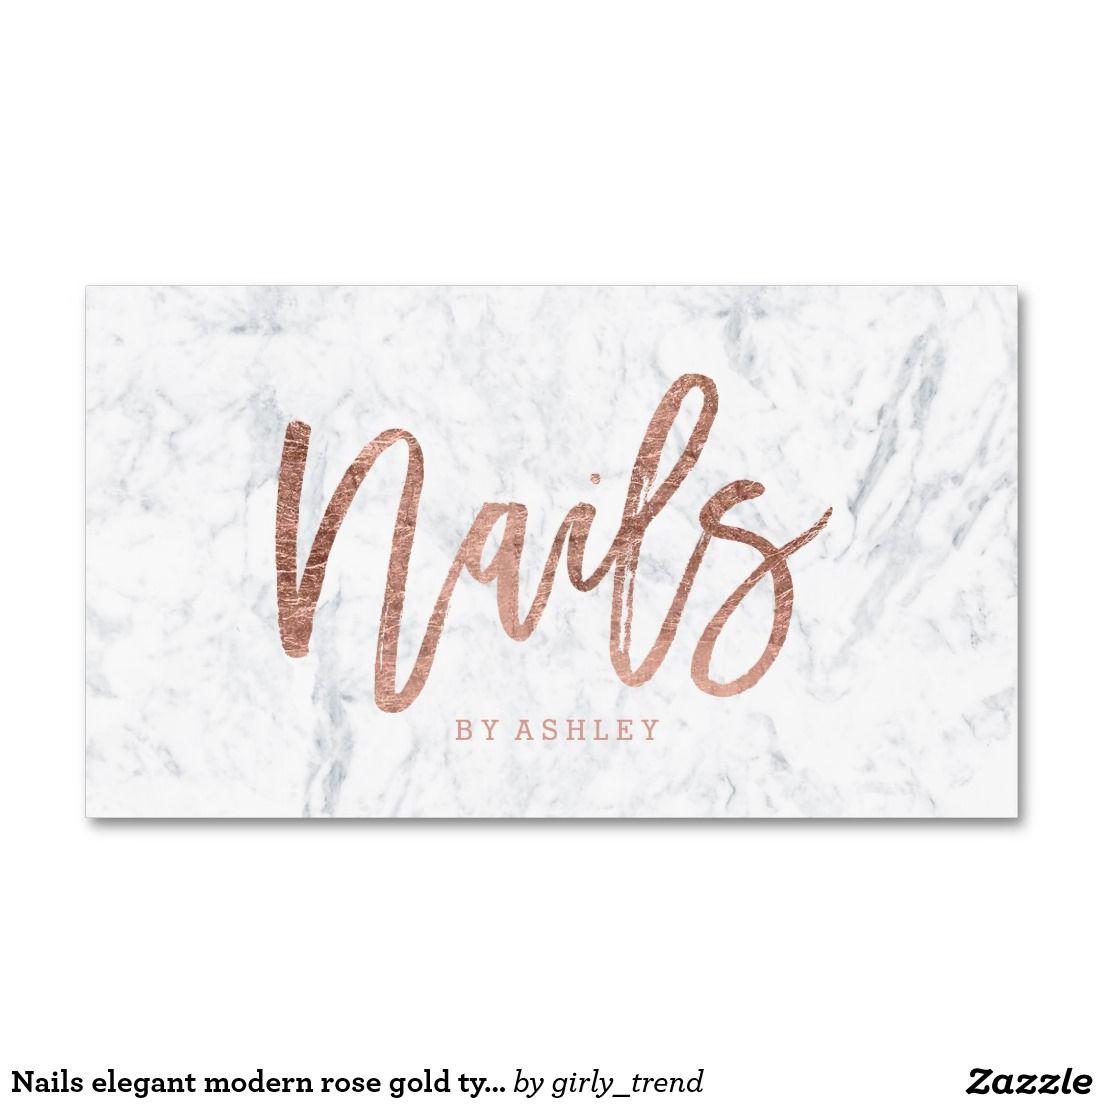 Nails elegant modern rose gold typography marble business card nails elegant modern rose gold typography marble business card colourmoves